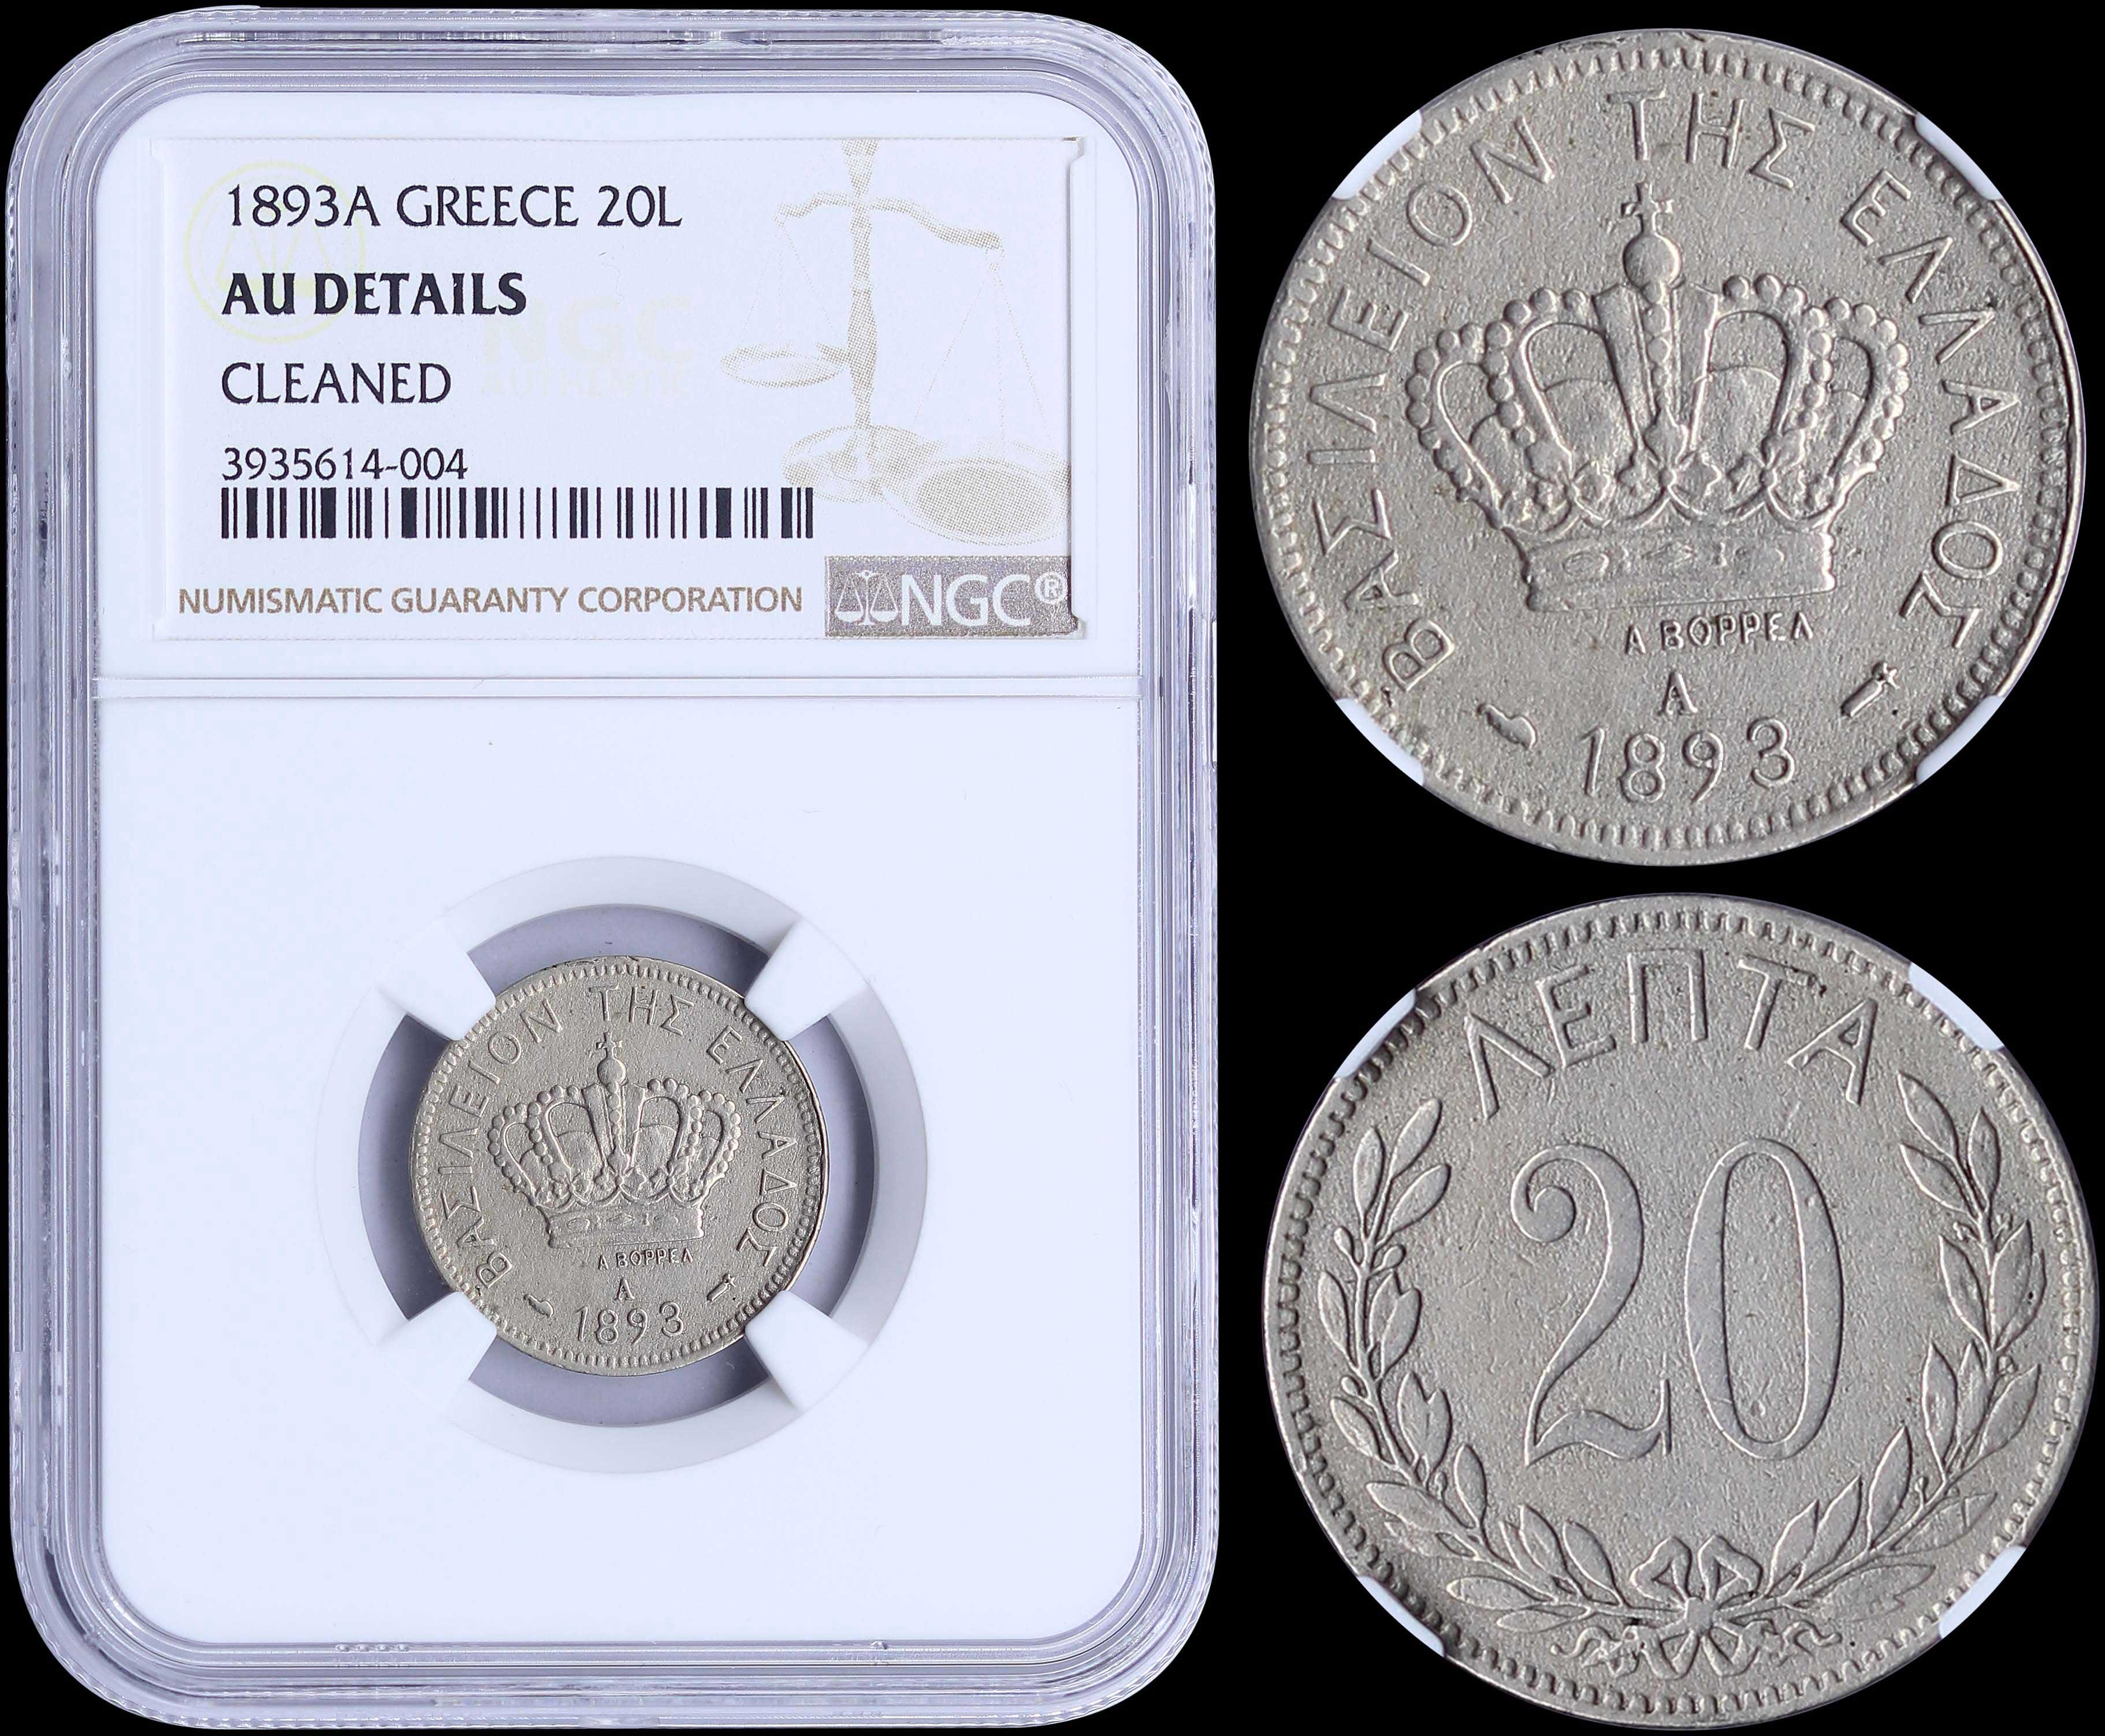 Lot 8105 - -  COINS & TOKENS king george i -  A. Karamitsos Public & Live Bid Auction 649 Coins, Medals & Banknotes